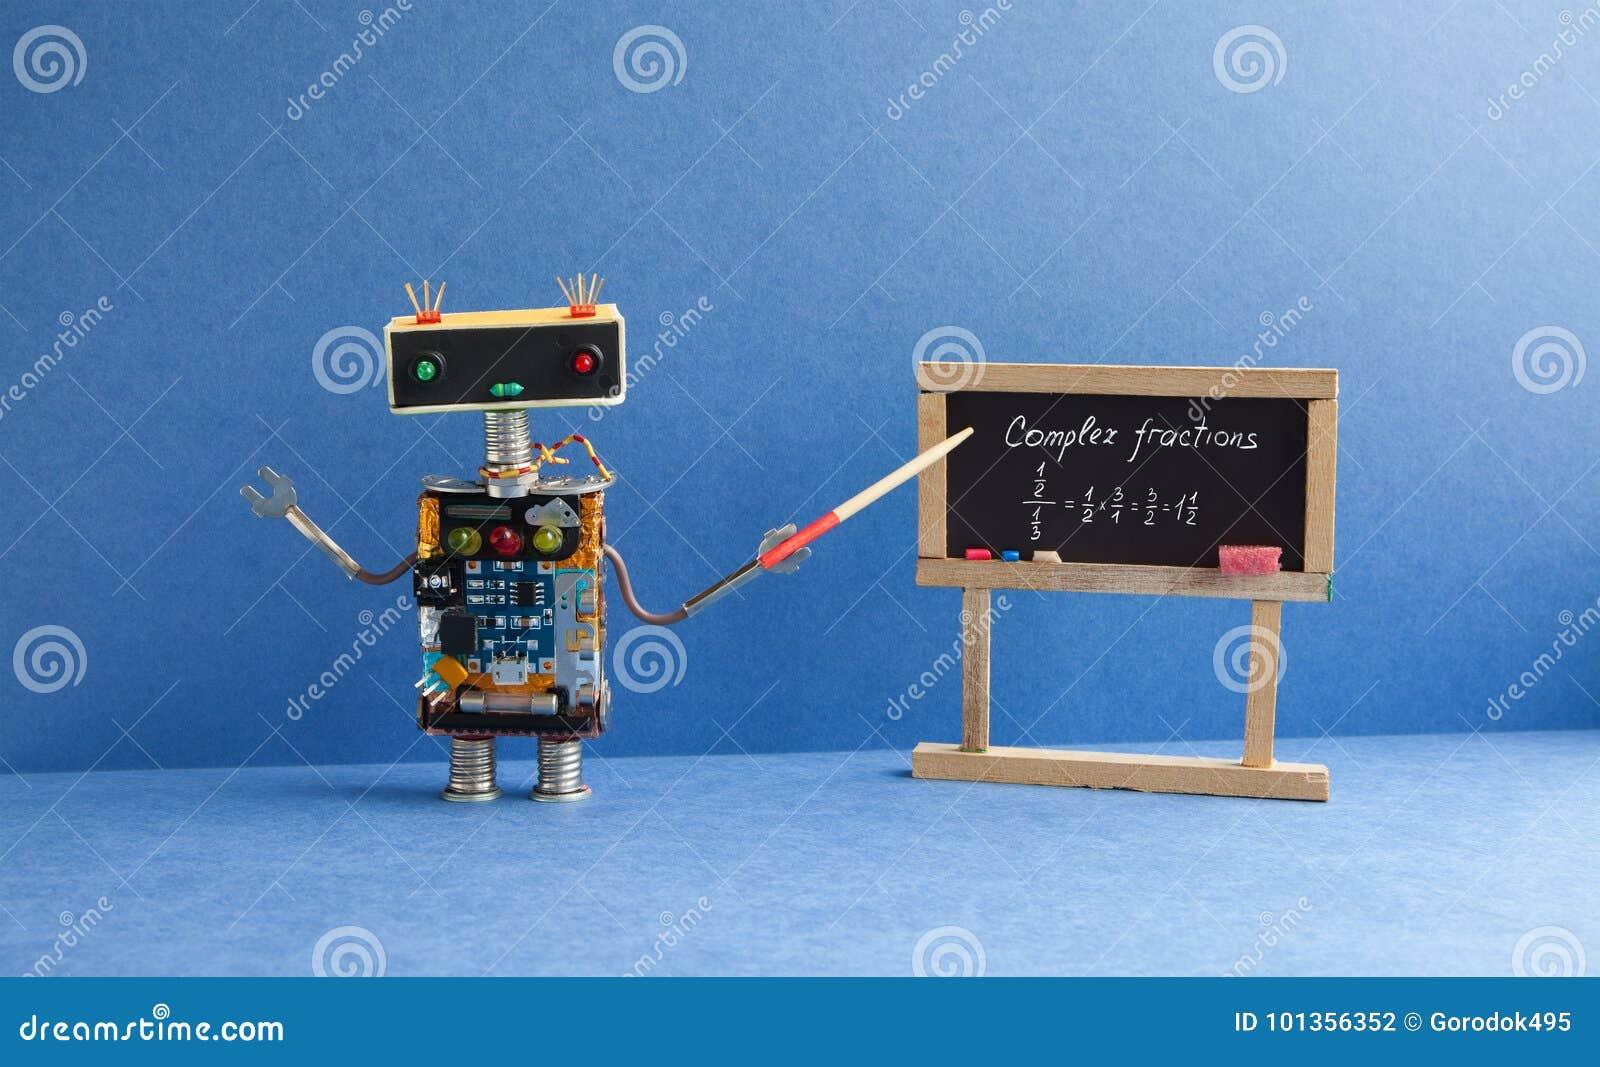 Complex Fractions Math Lesson. Mathematician Robot Teacher With ...